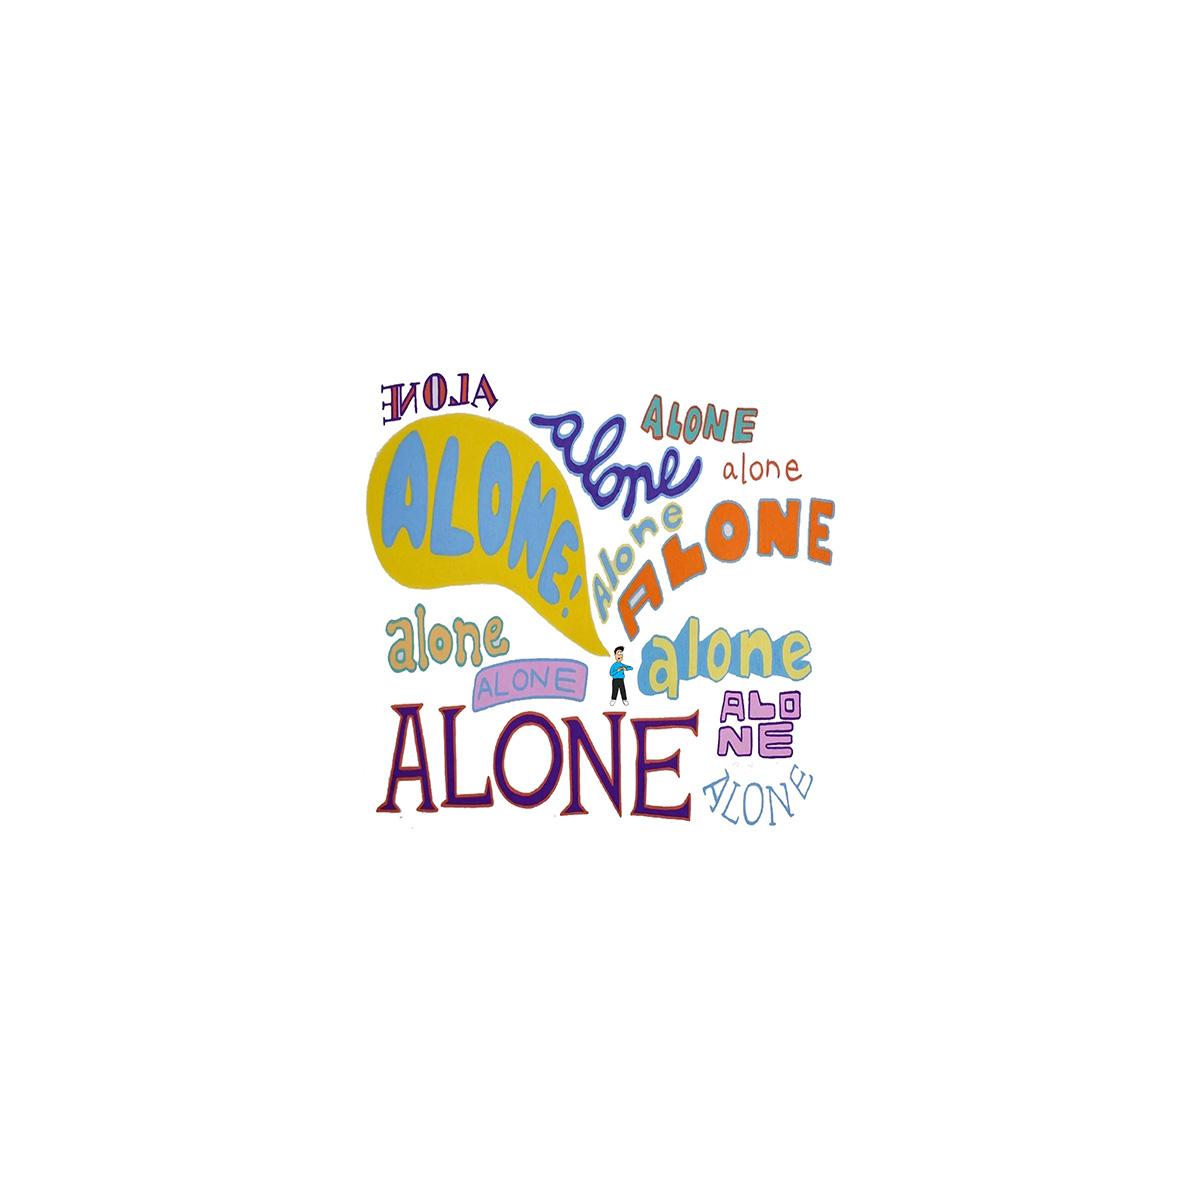 alone 6a